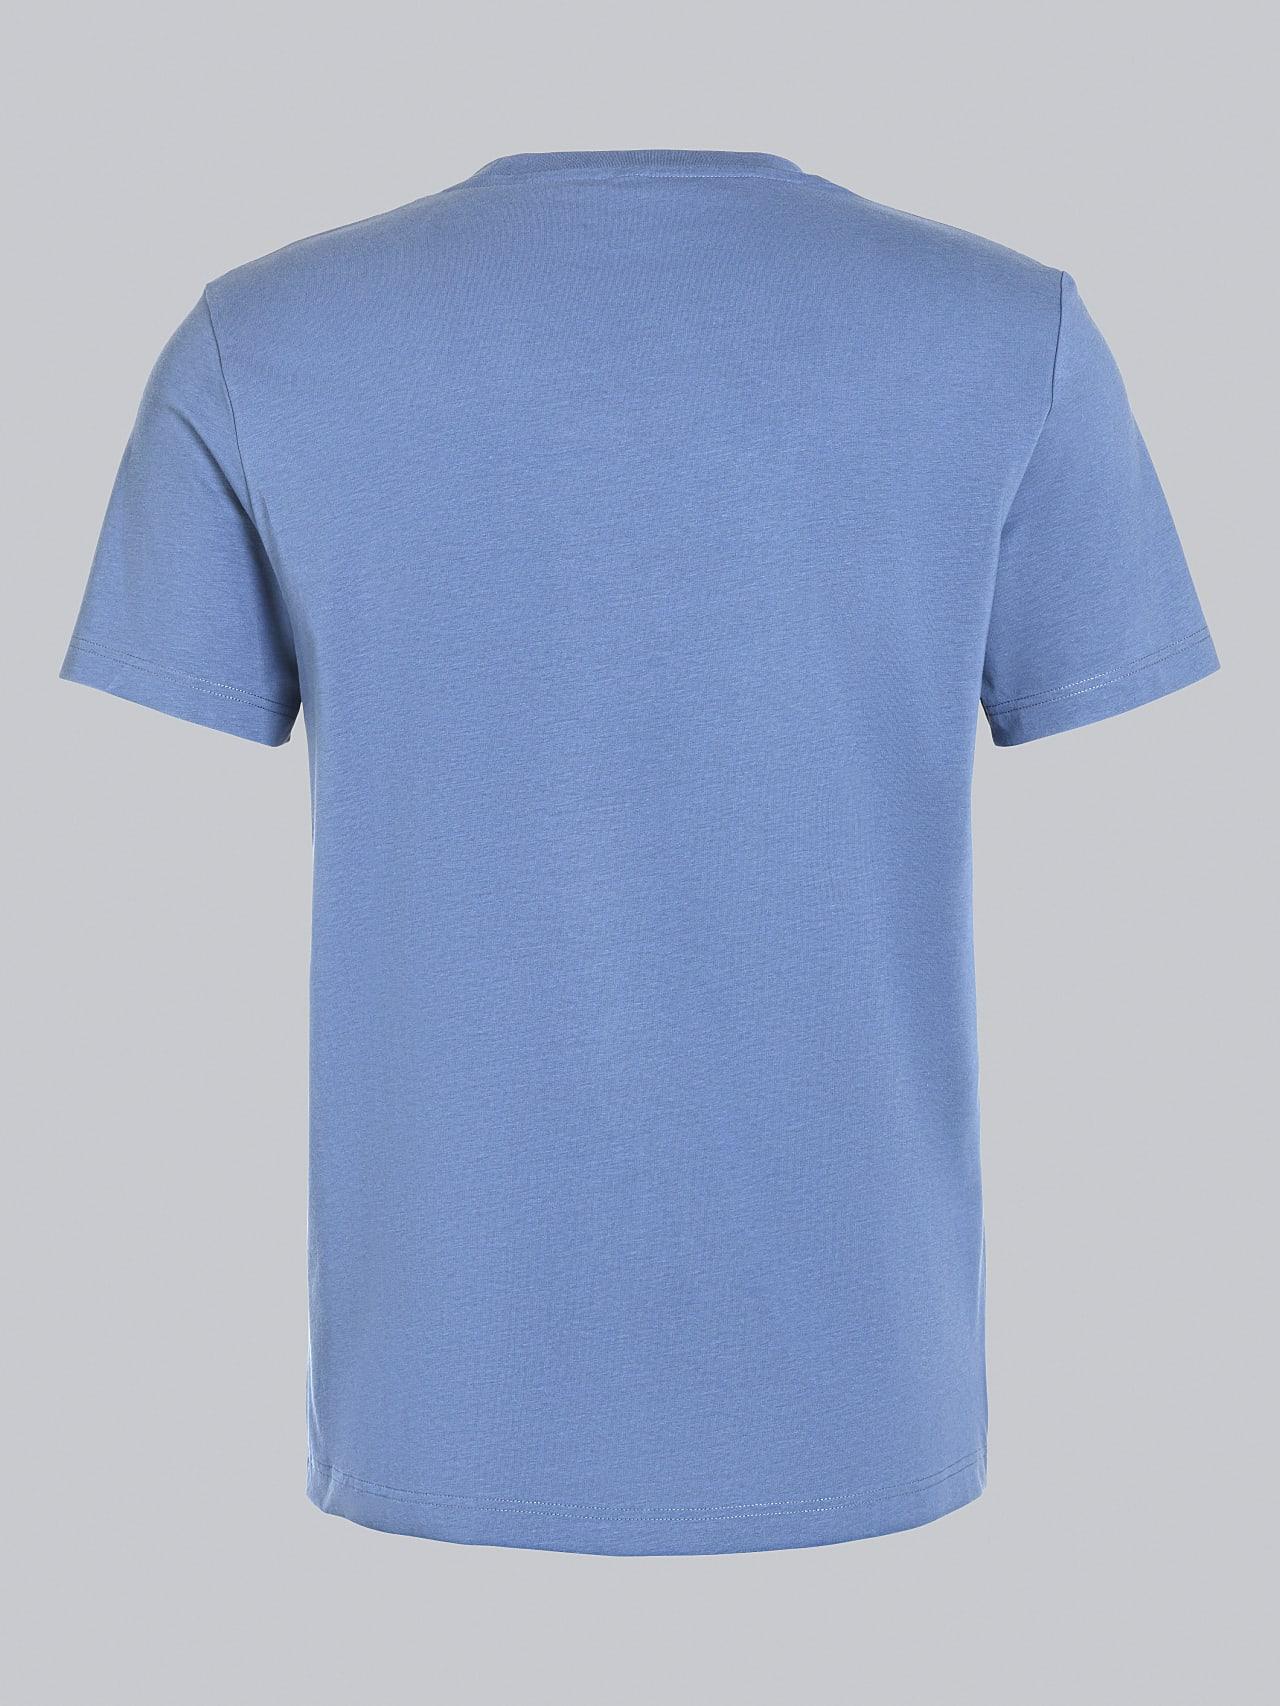 JABIS V1.Y5.02 Logo Print T-Shirt light blue Left Alpha Tauri